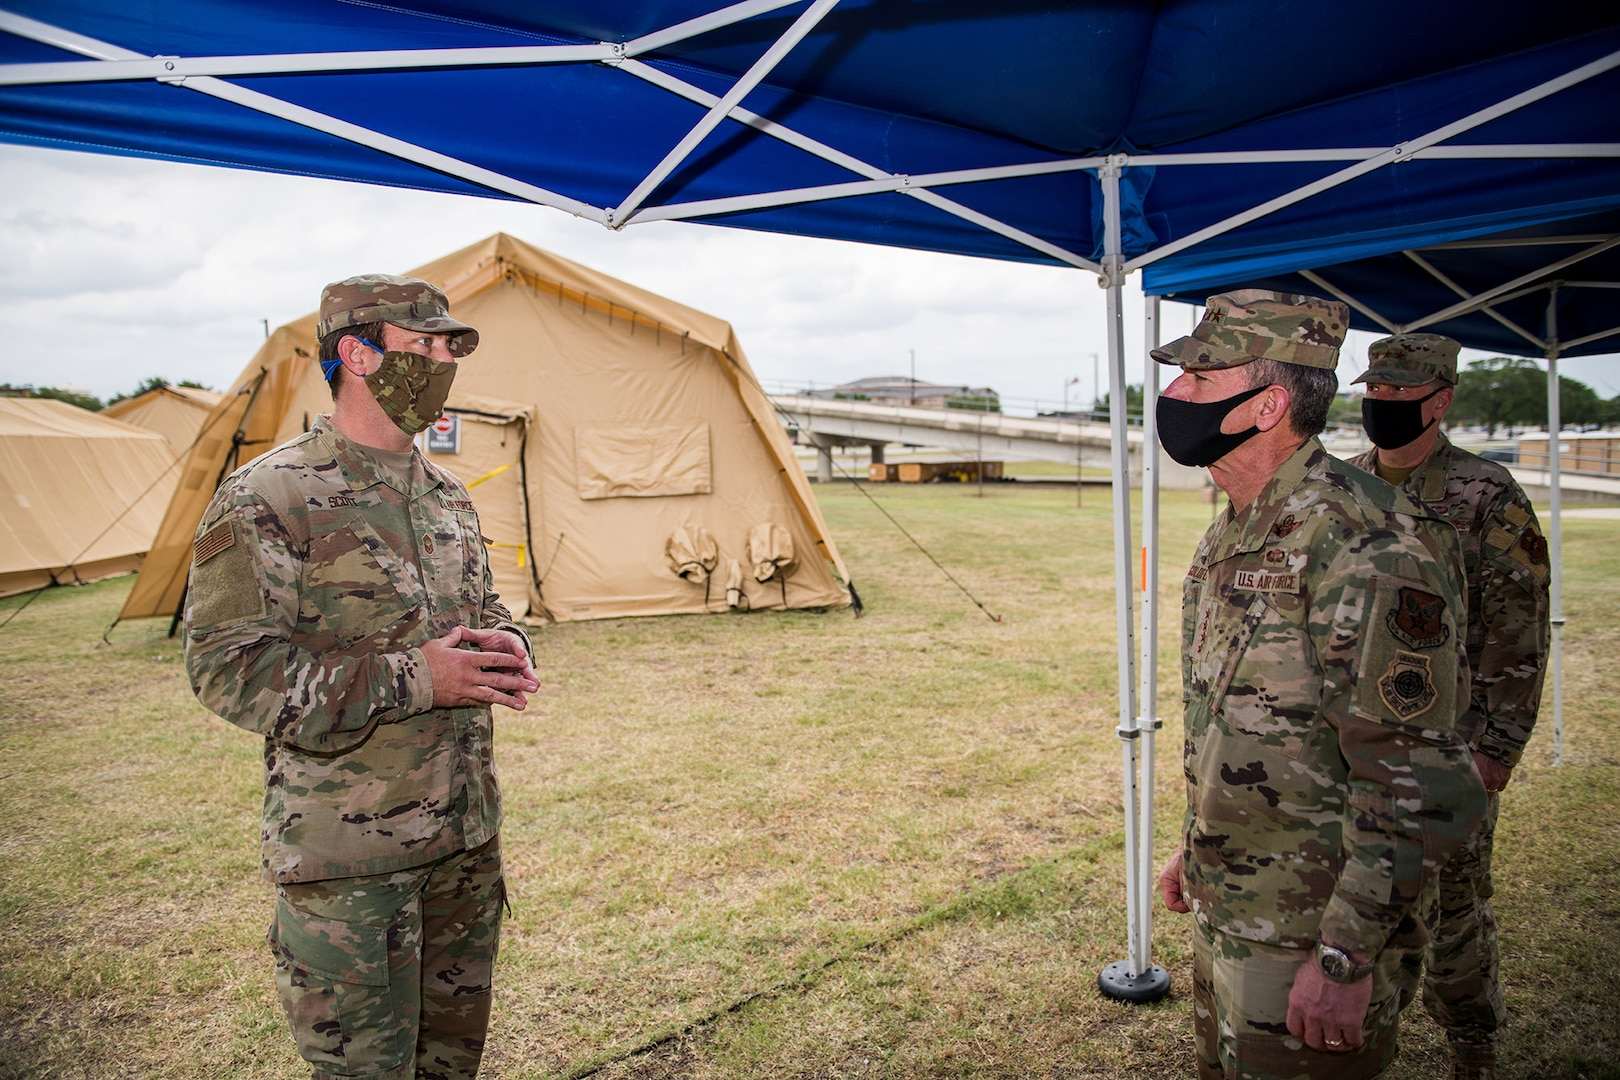 Air Force Chief of Staff Gen. David L. Goldfein visits Reid Clinic May 7, 2020, at Joint Base San Antonio-Lackland, Texas.